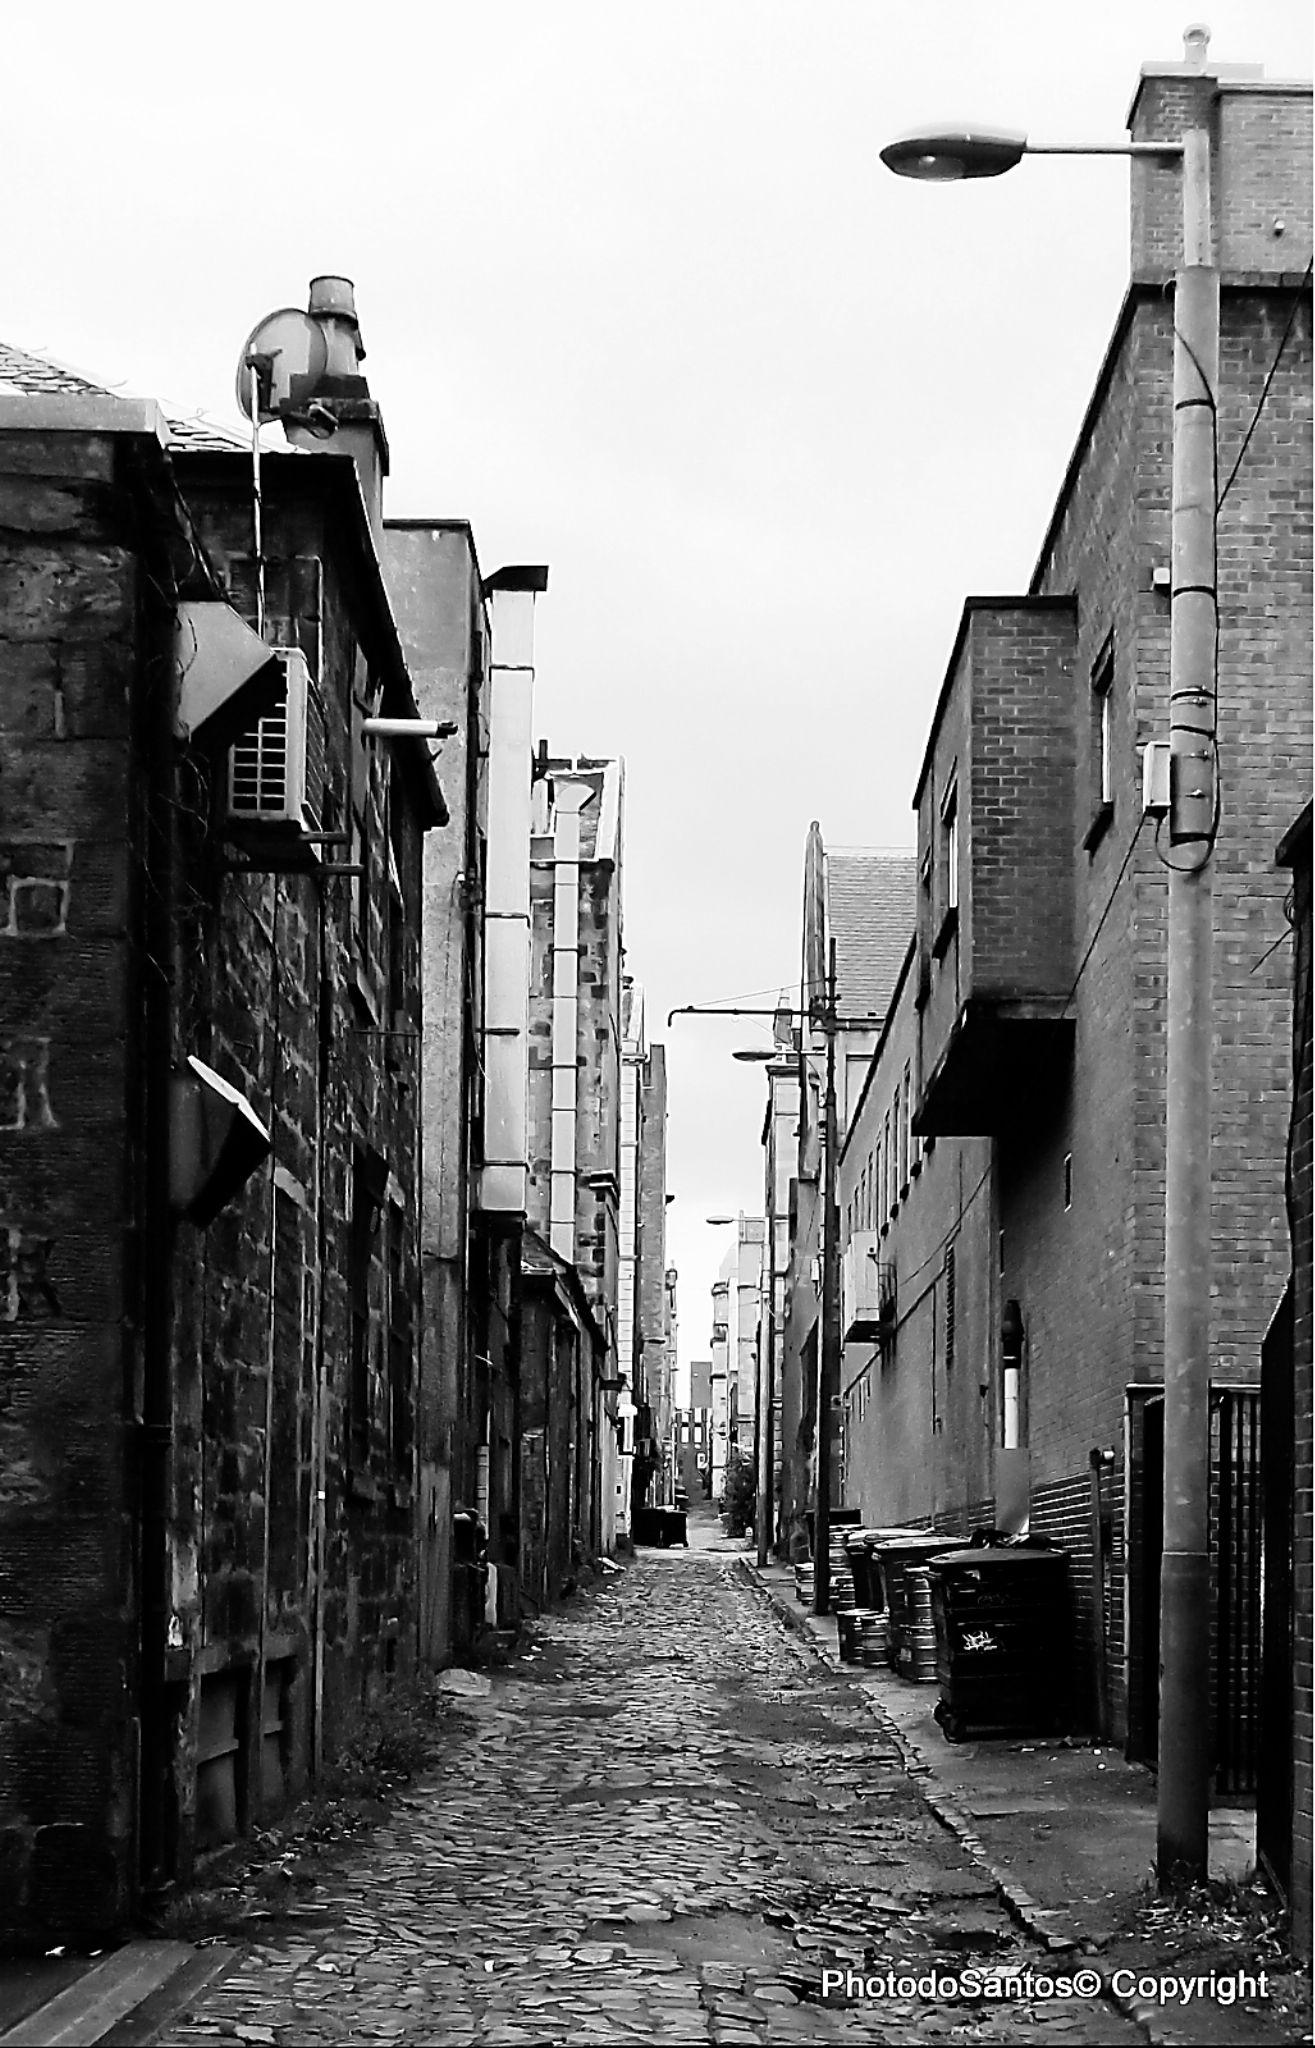 Where the Streets Have No Name by Ricardo Santos